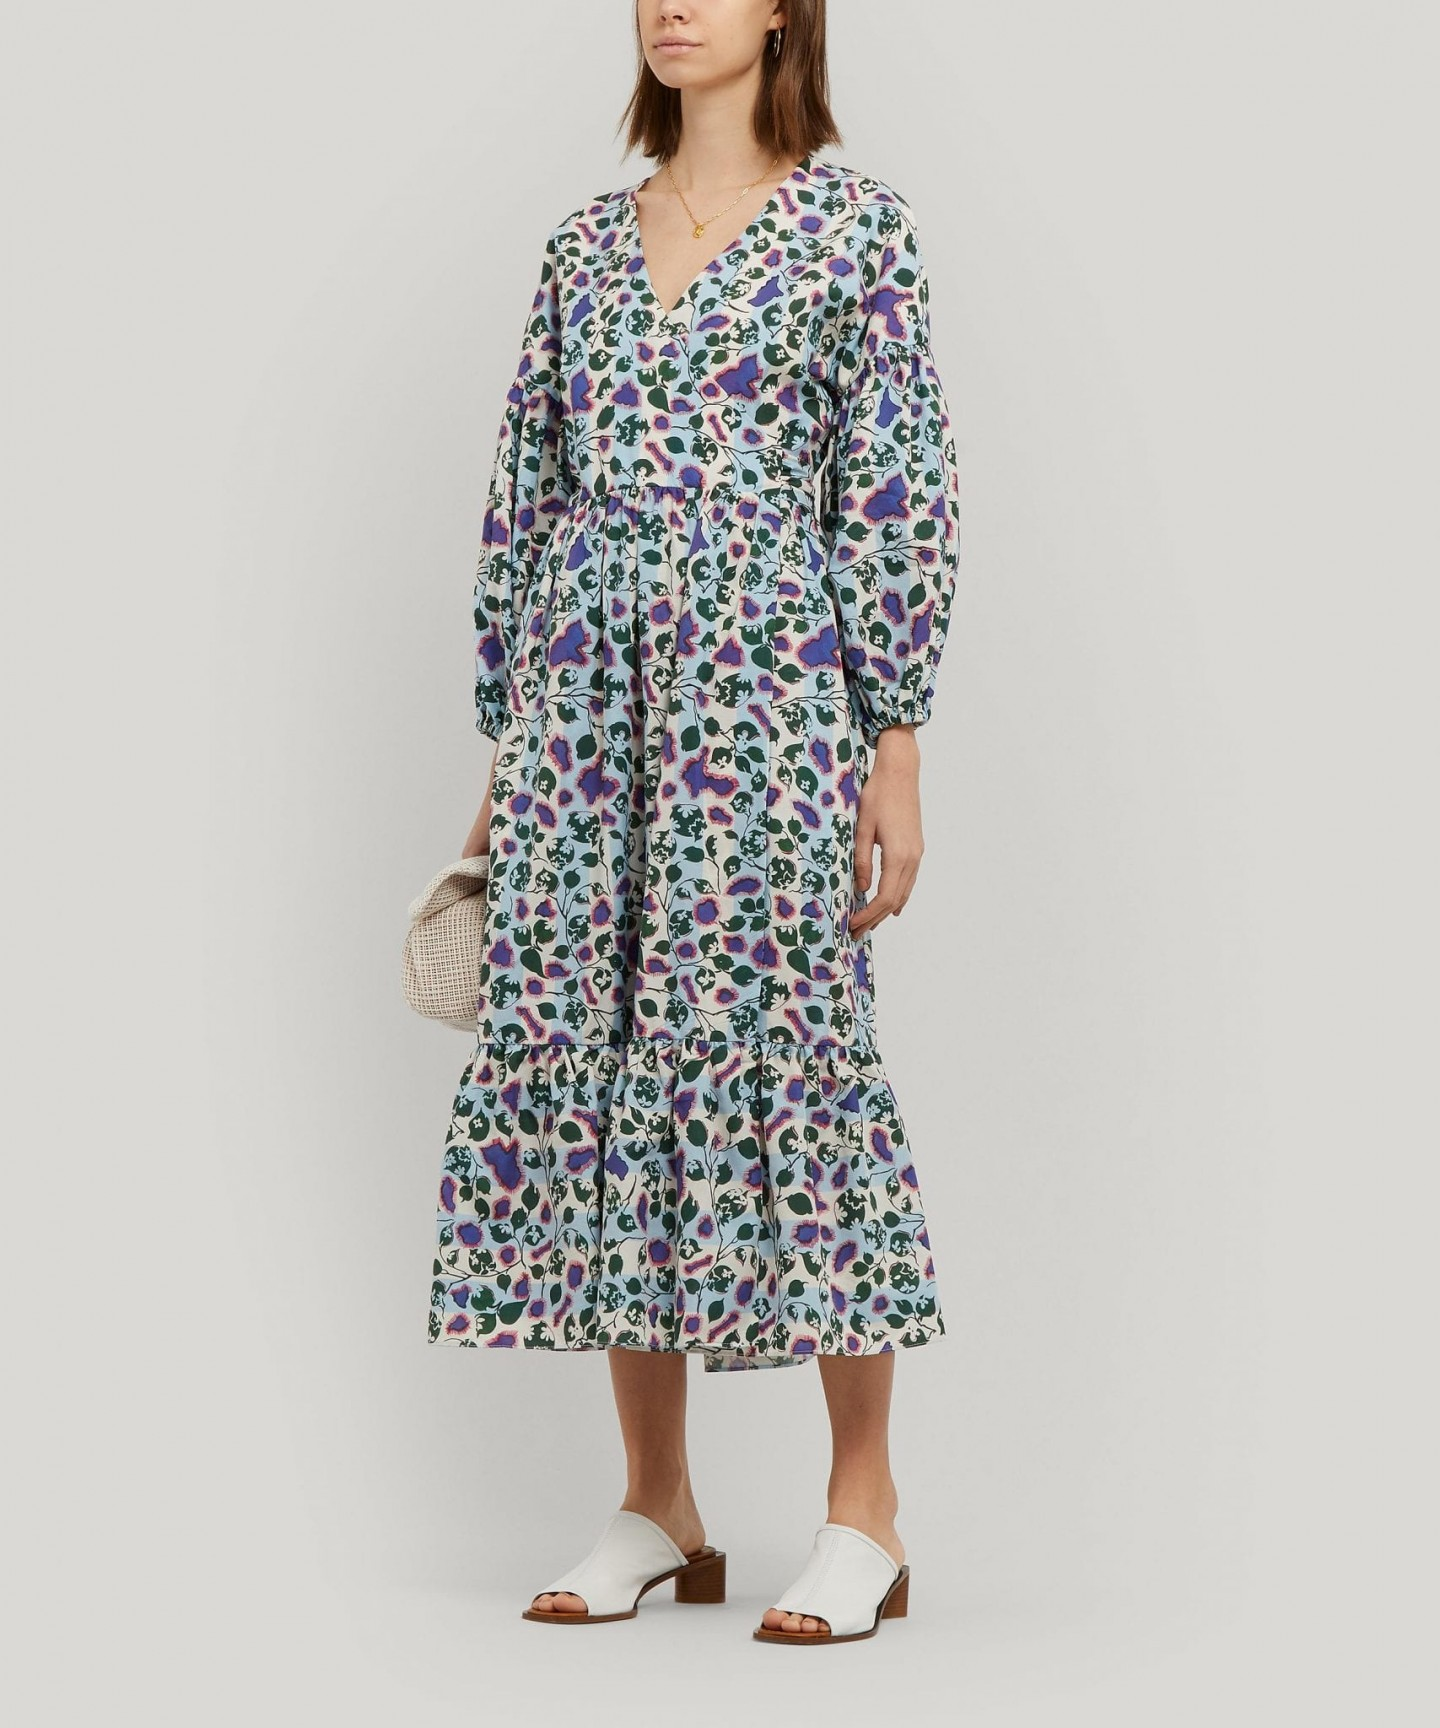 LIBERTY Dorothea Woven Jacquard Wrap Dress